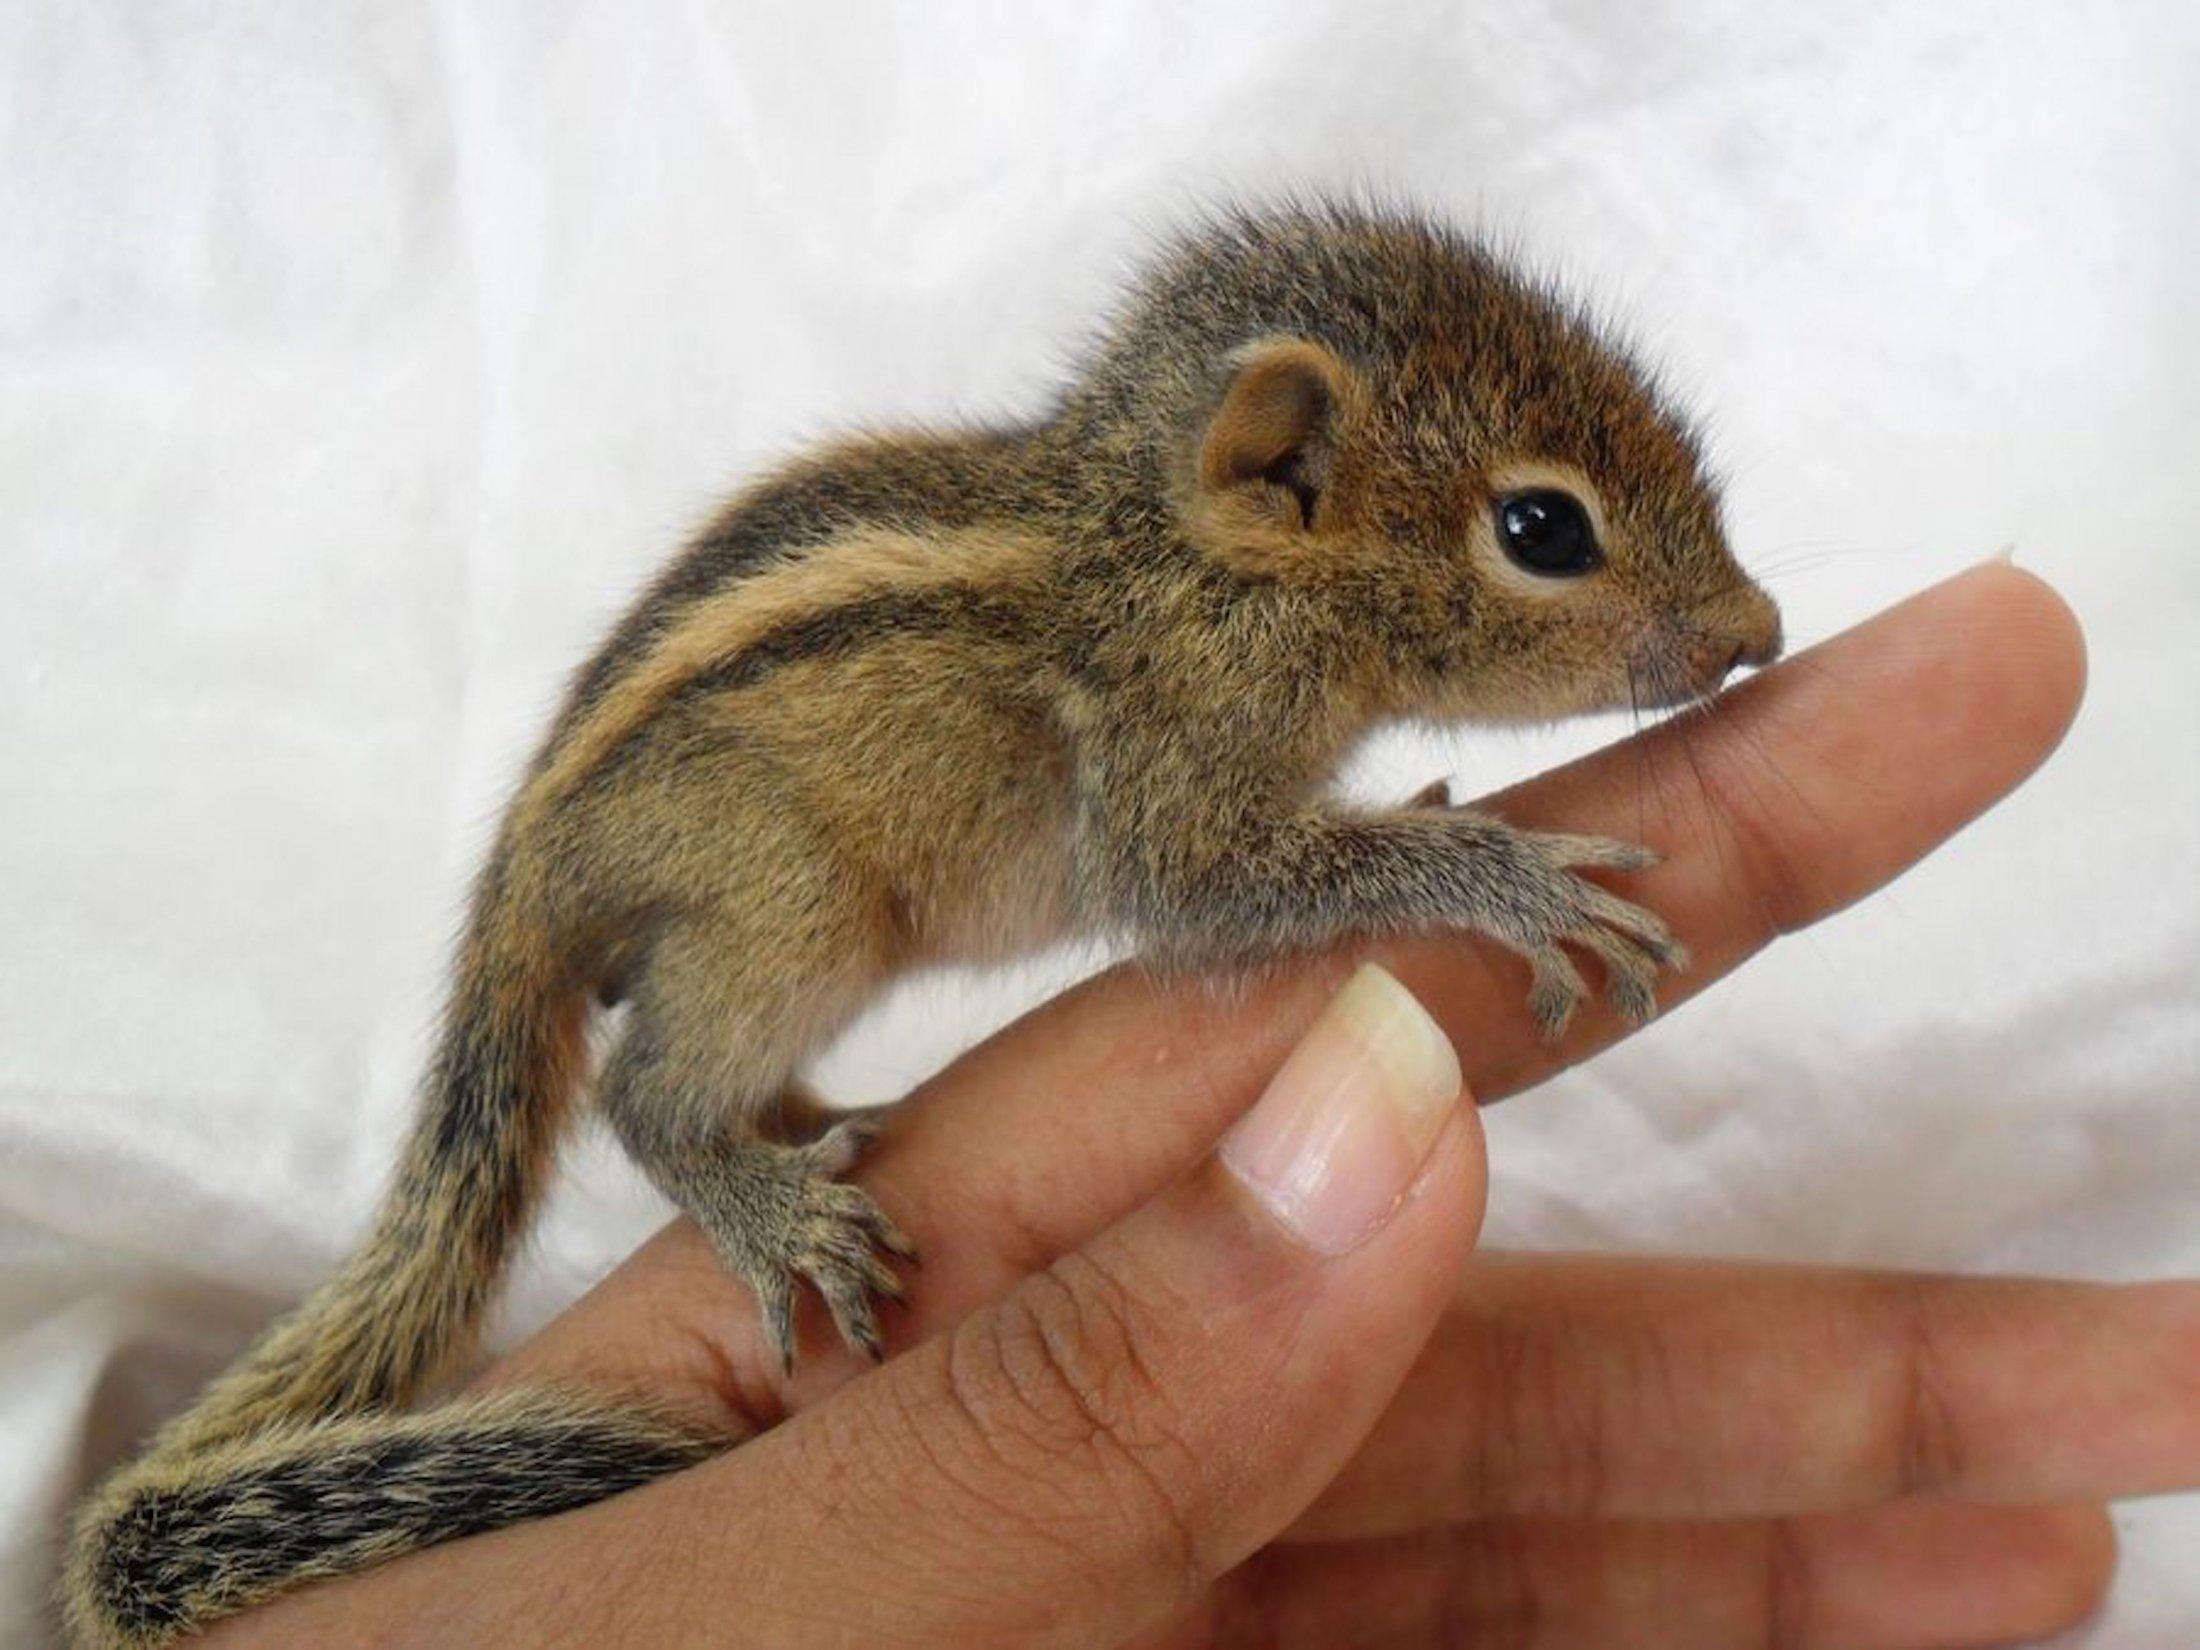 Baby chipmunk on a finger